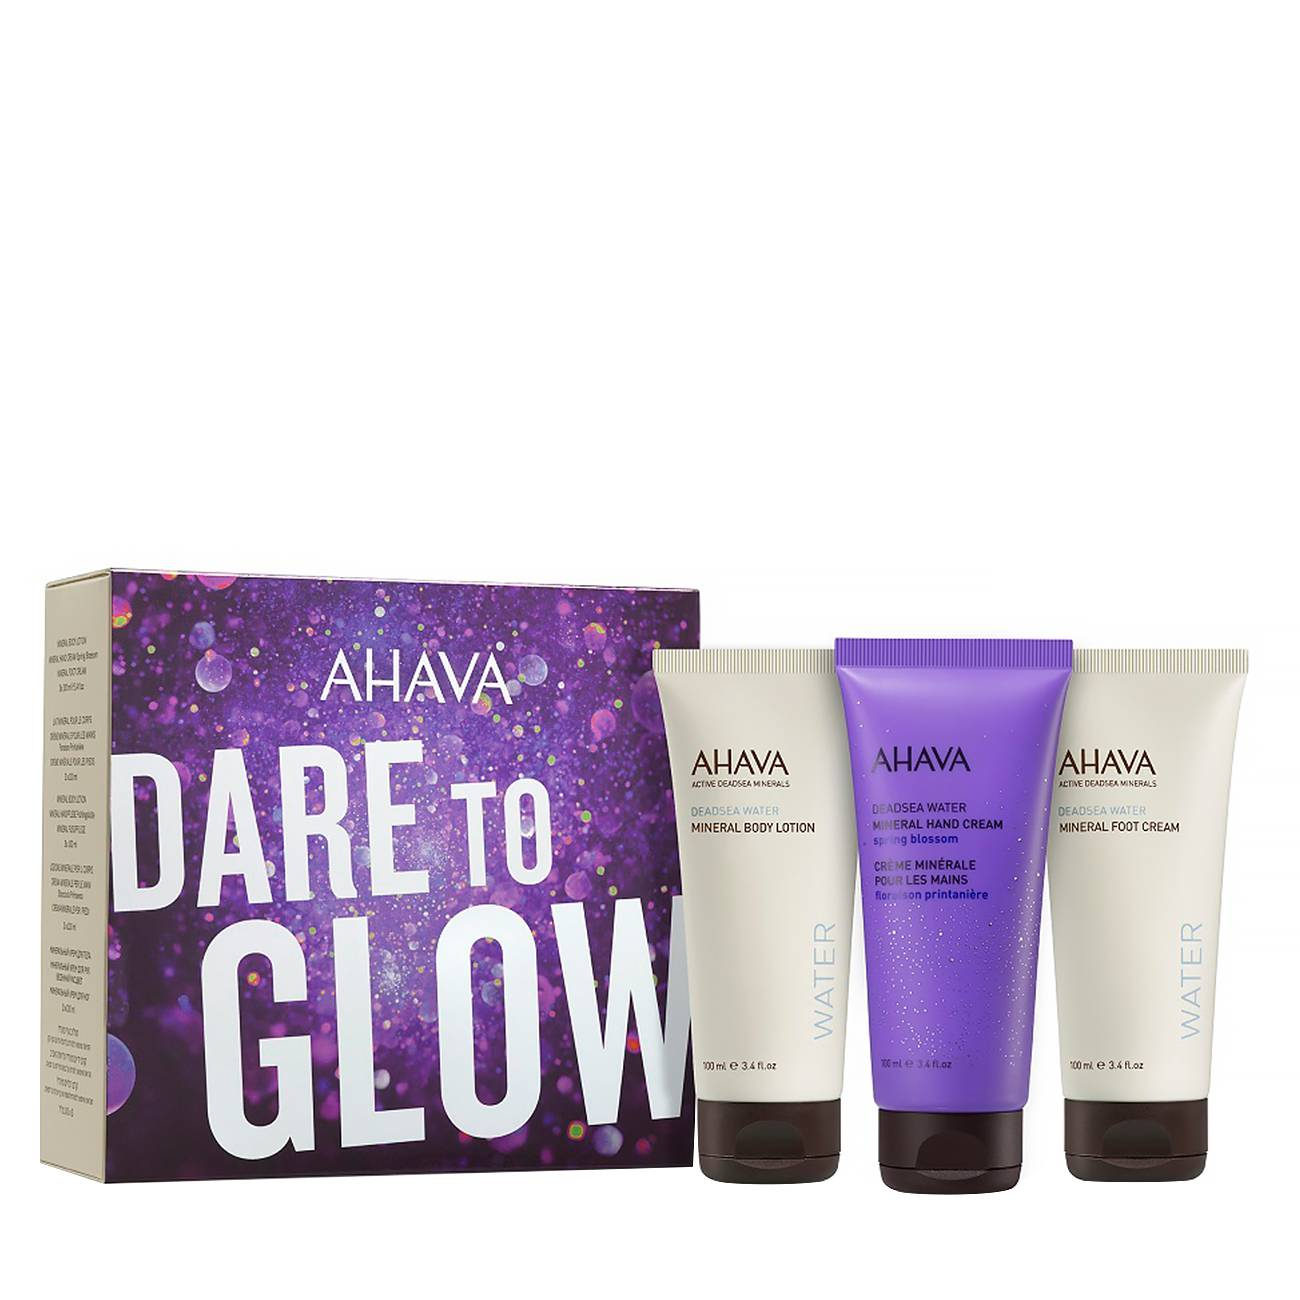 Dare To Glow Kit Set 300ml Ahava imagine 2021 bestvalue.eu